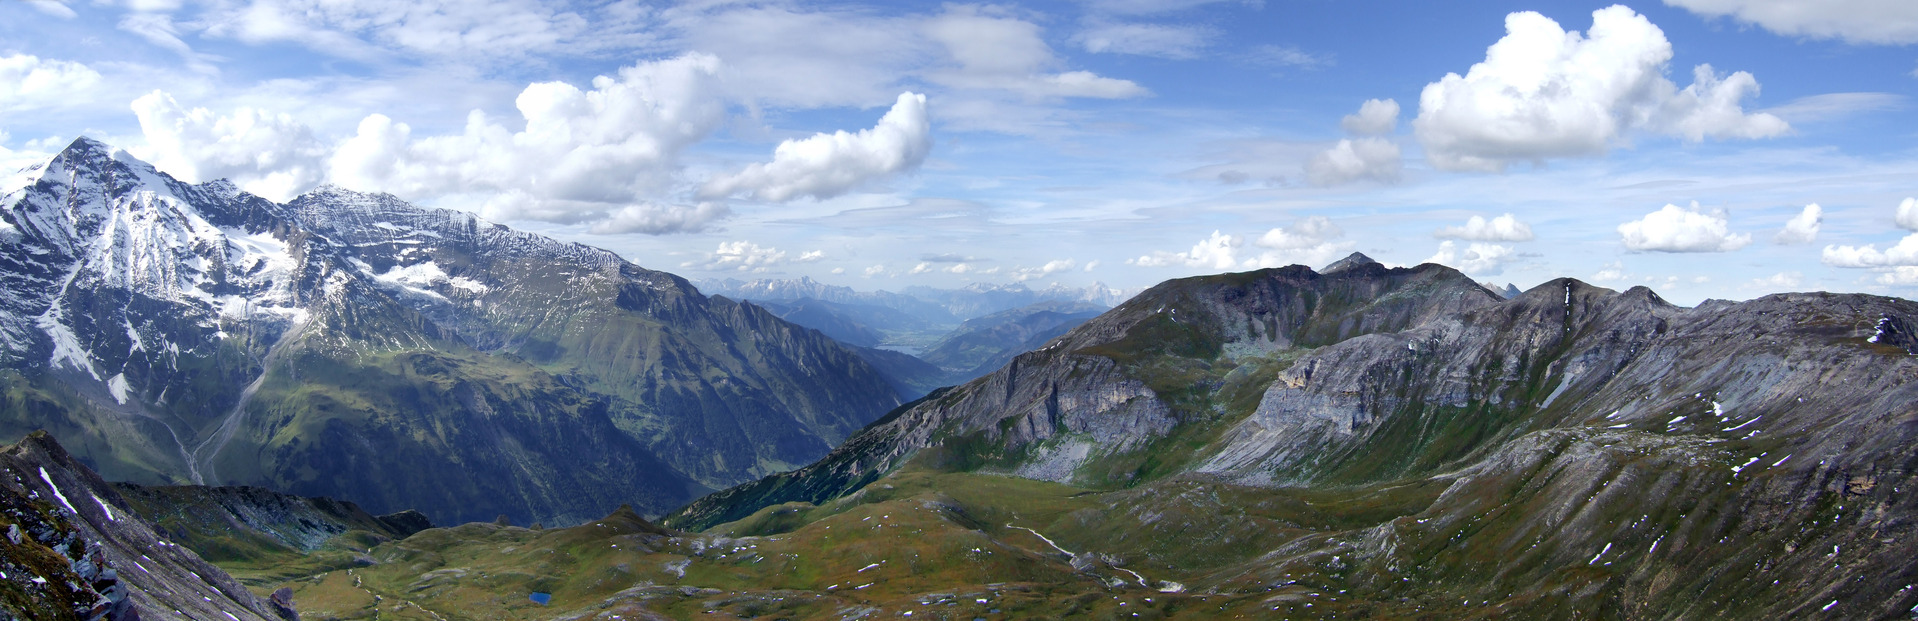 https://gasthofpost-bruck.at/de/wp-content/uploads/2016/09/grossglockner-mountain-austria-1390183-1918x620.jpg